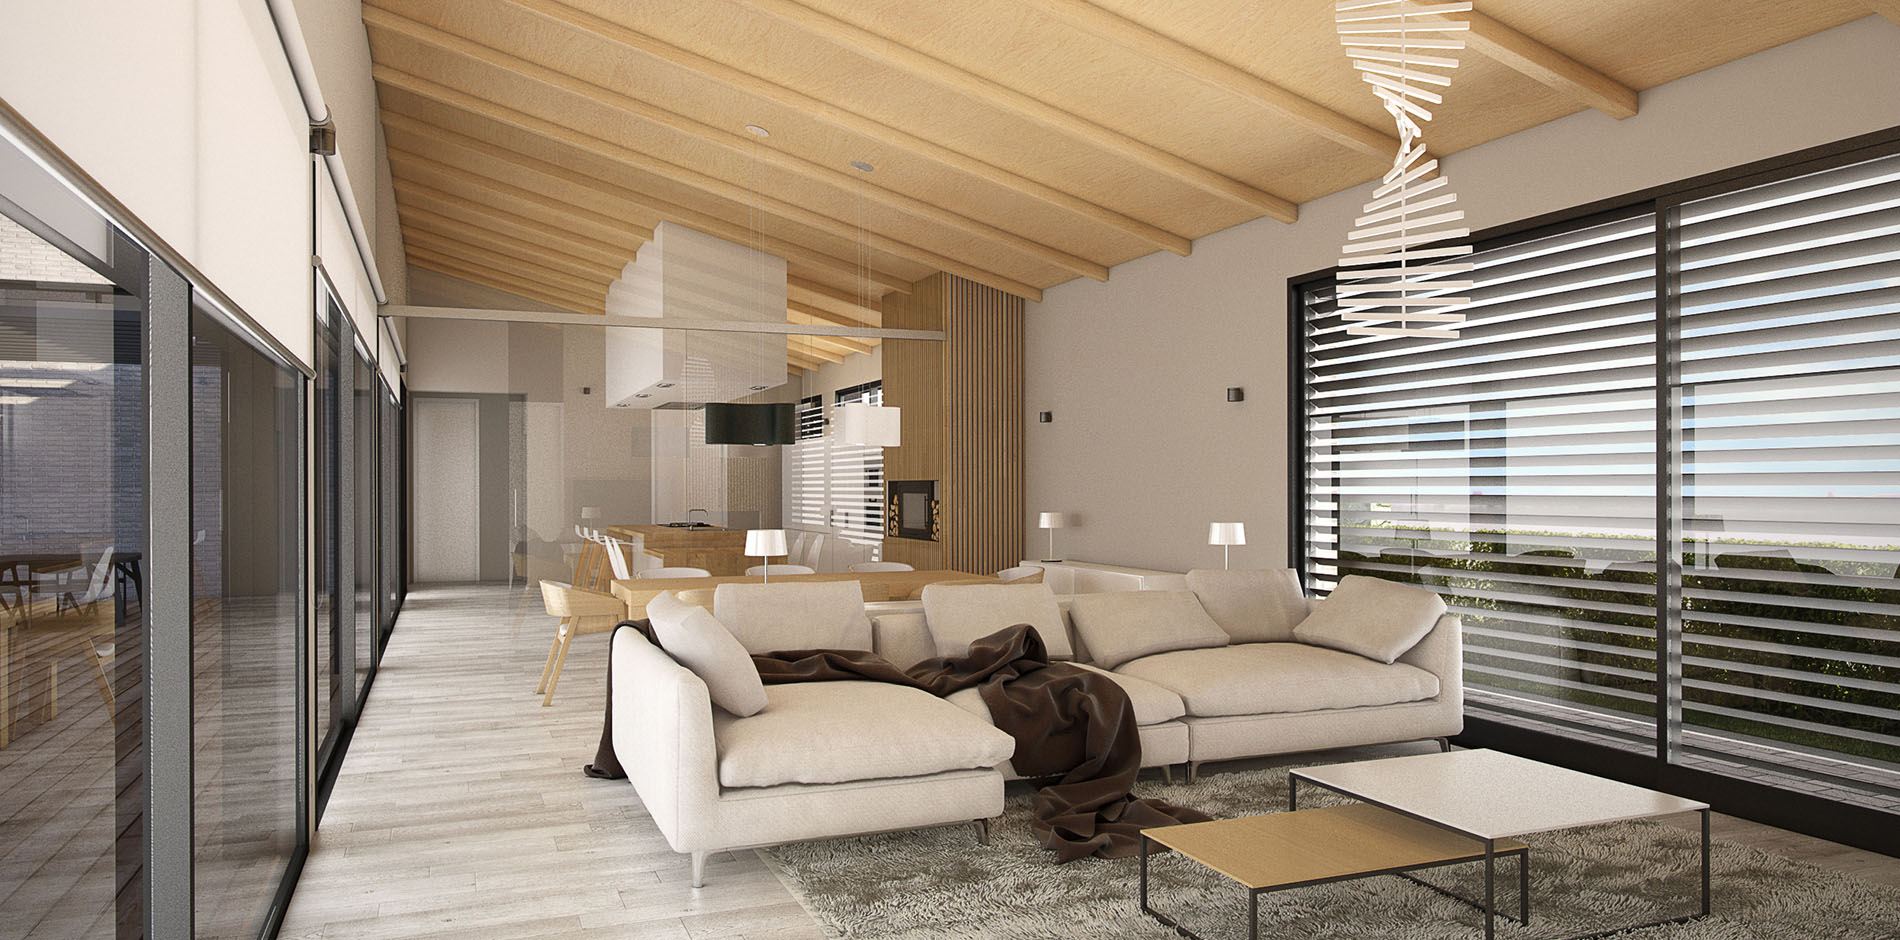 garnica_plywood_contrachapado_reinforced